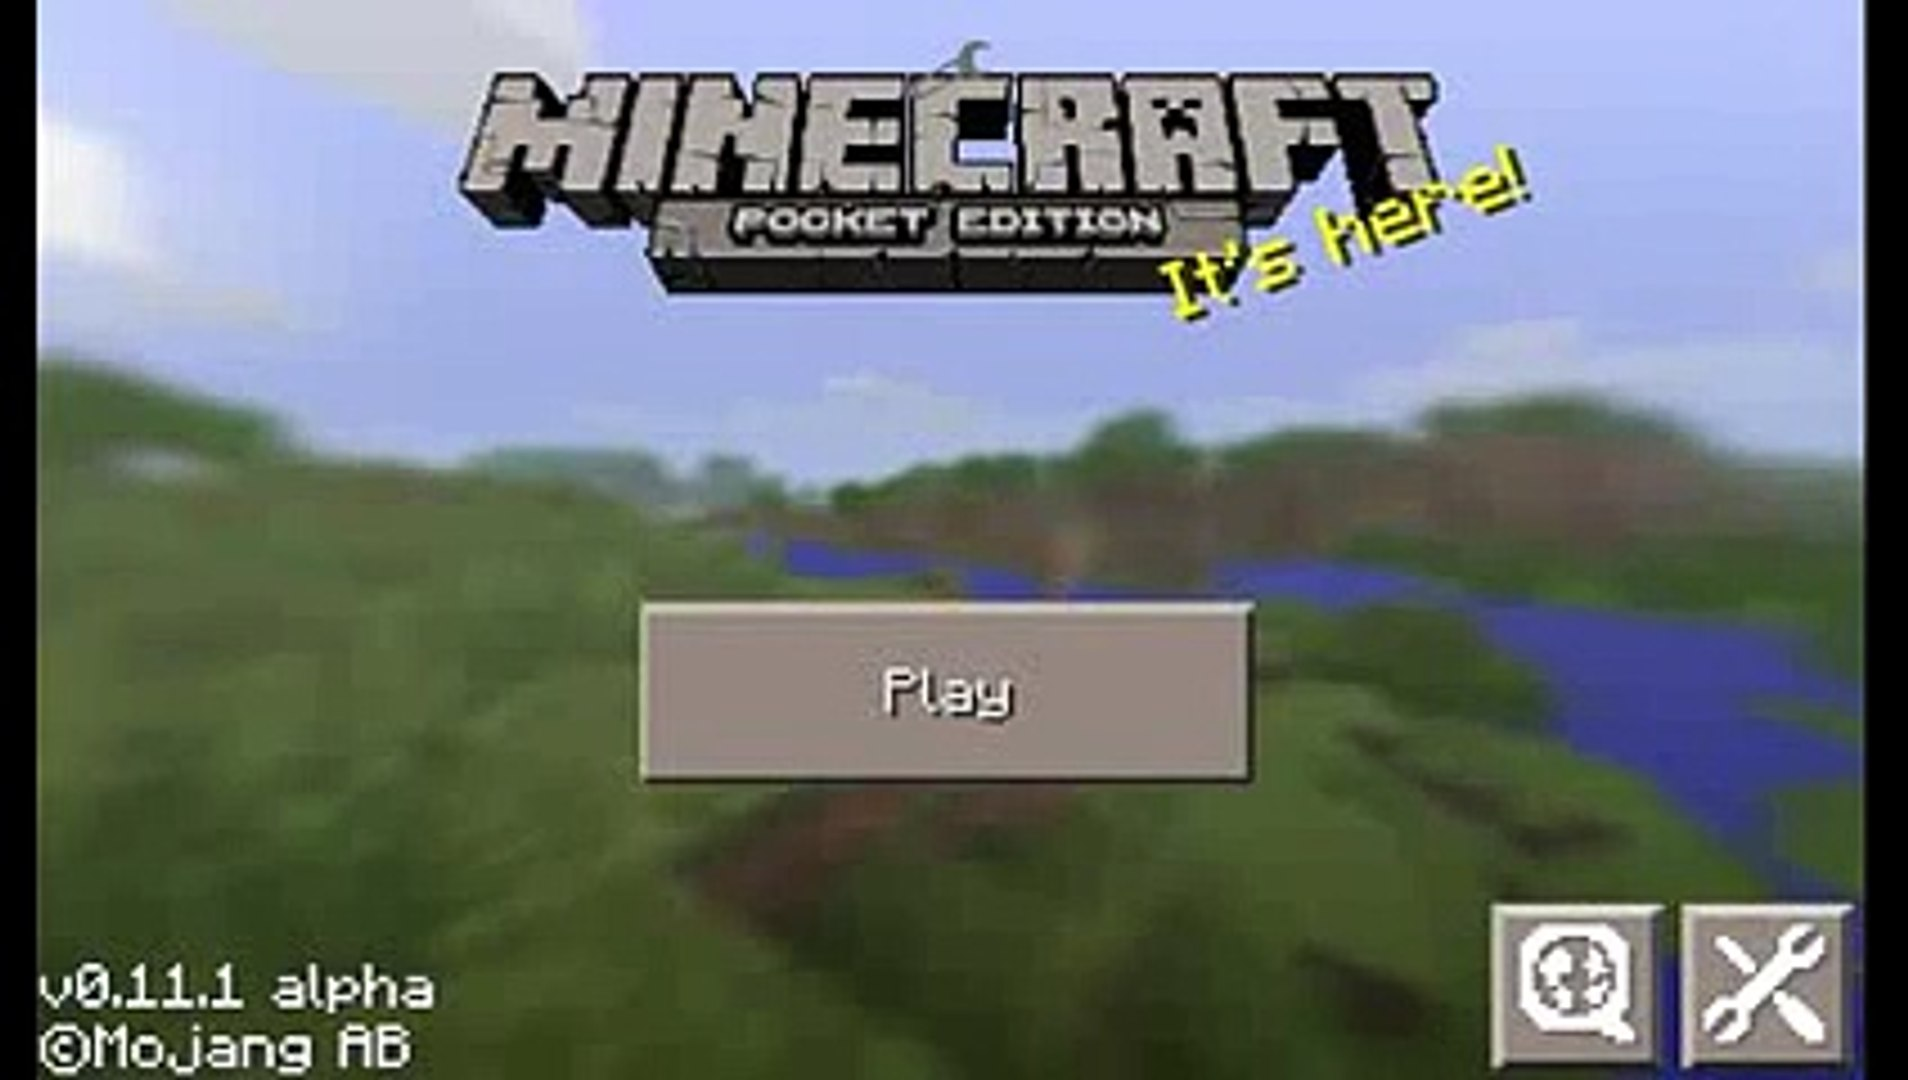 minecraft 1.9.9 full version free download